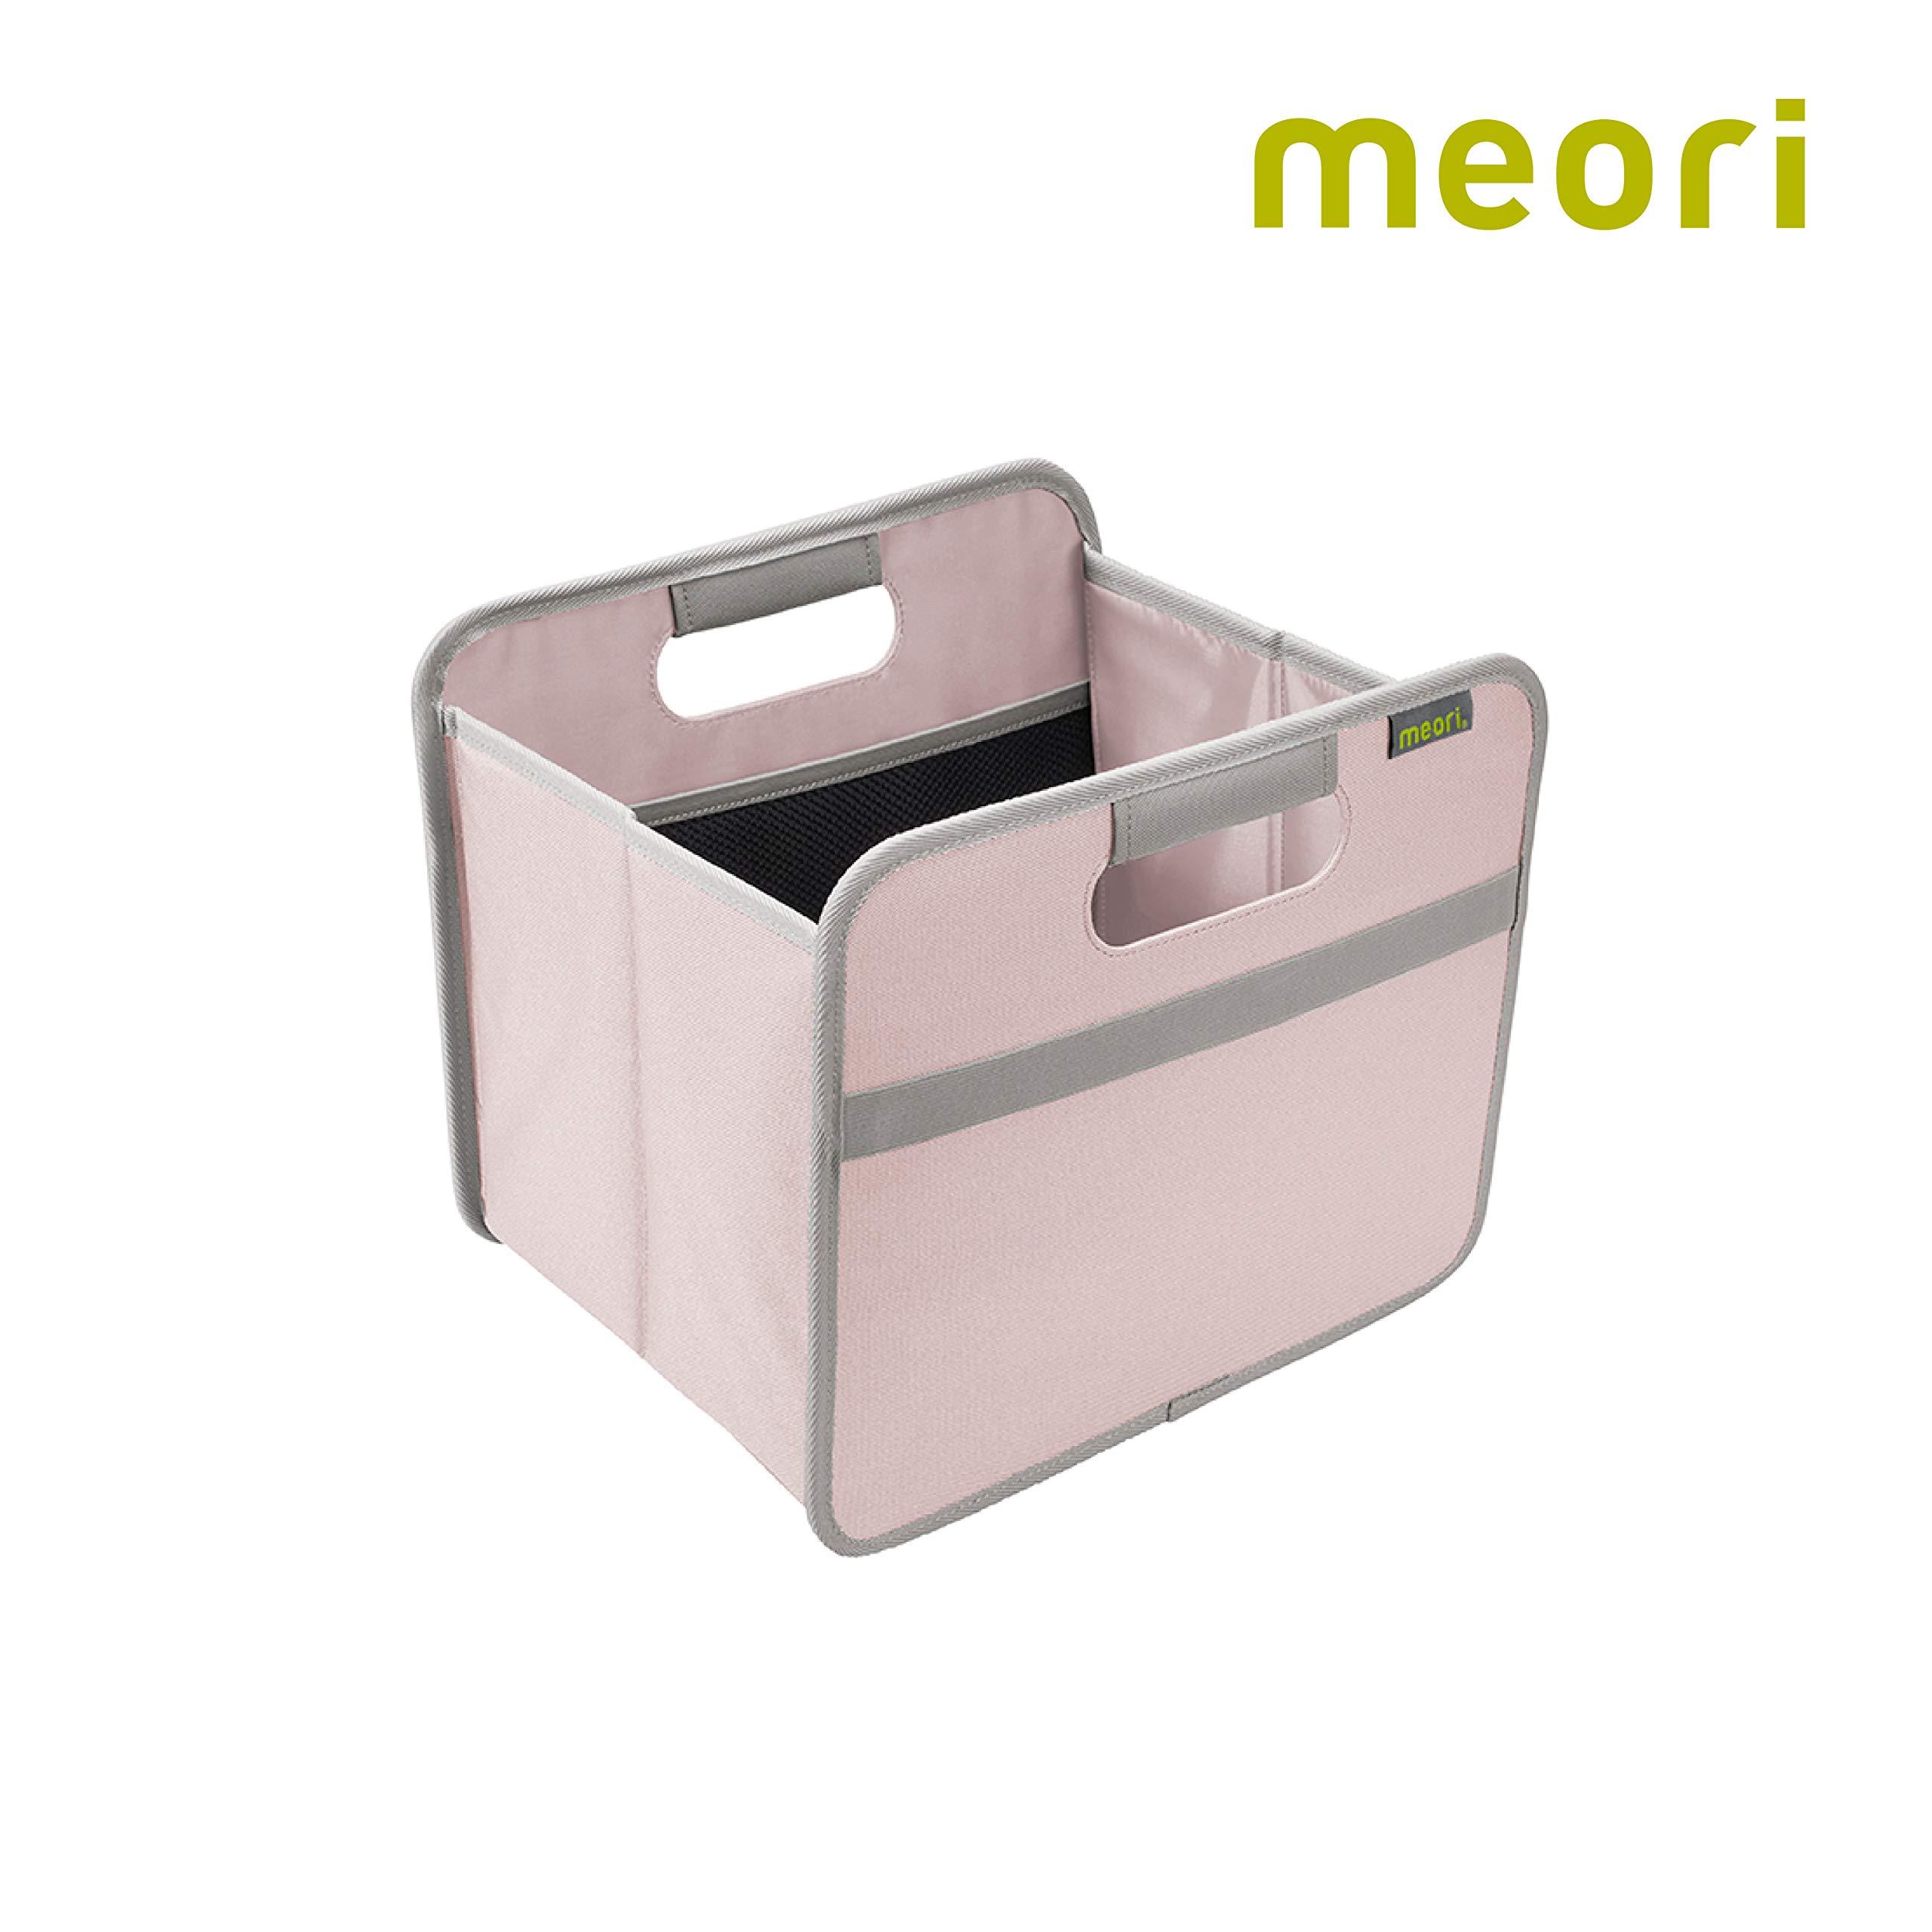 meori Rose Foldable Box Small Dream Shelf Storage Organizer Home Bathroom Wardrobe Kitchen Wipeable Stylish 15 Liter/4 Gallon, 1-Pack